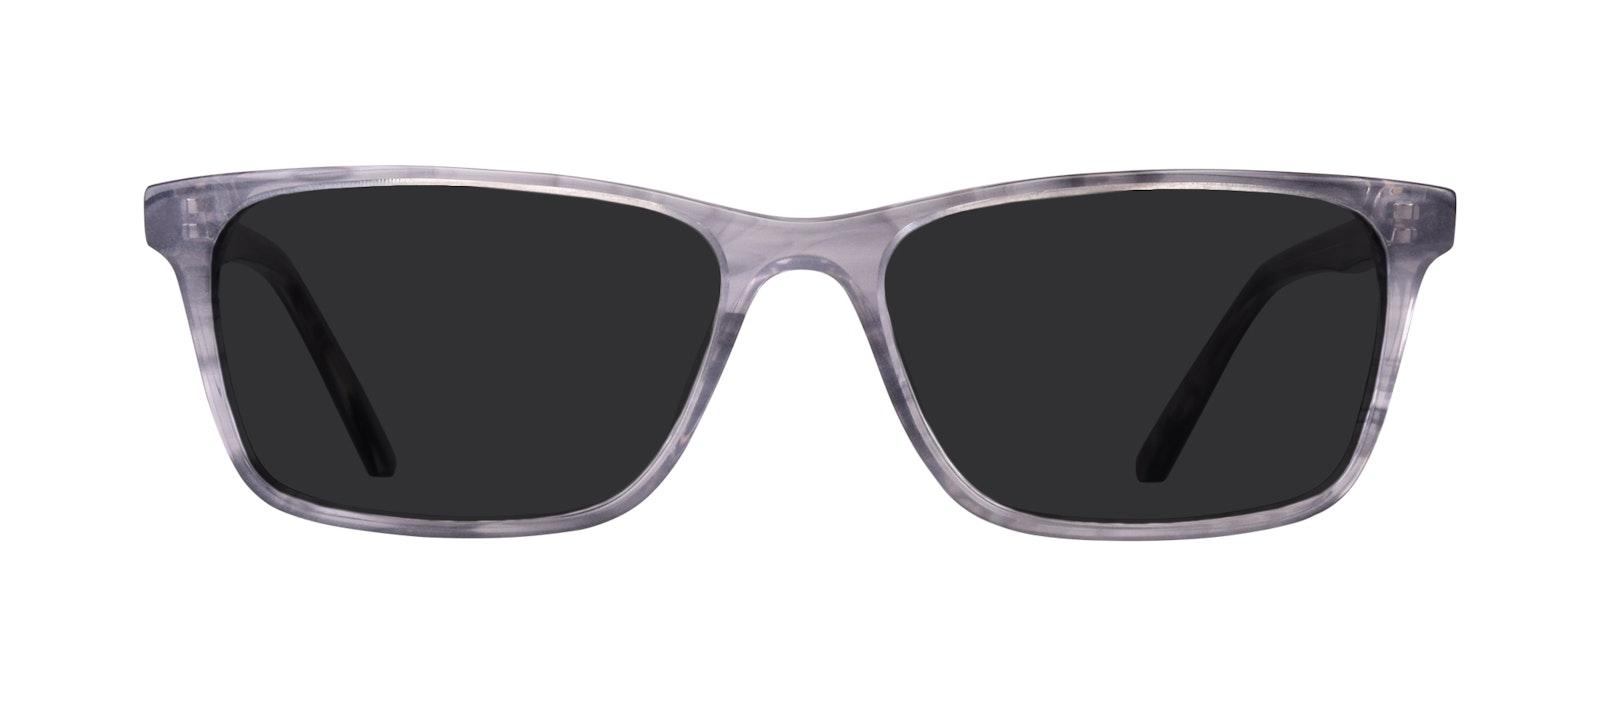 Affordable Fashion Glasses Rectangle Sunglasses Men Henri Smokey Grey Front